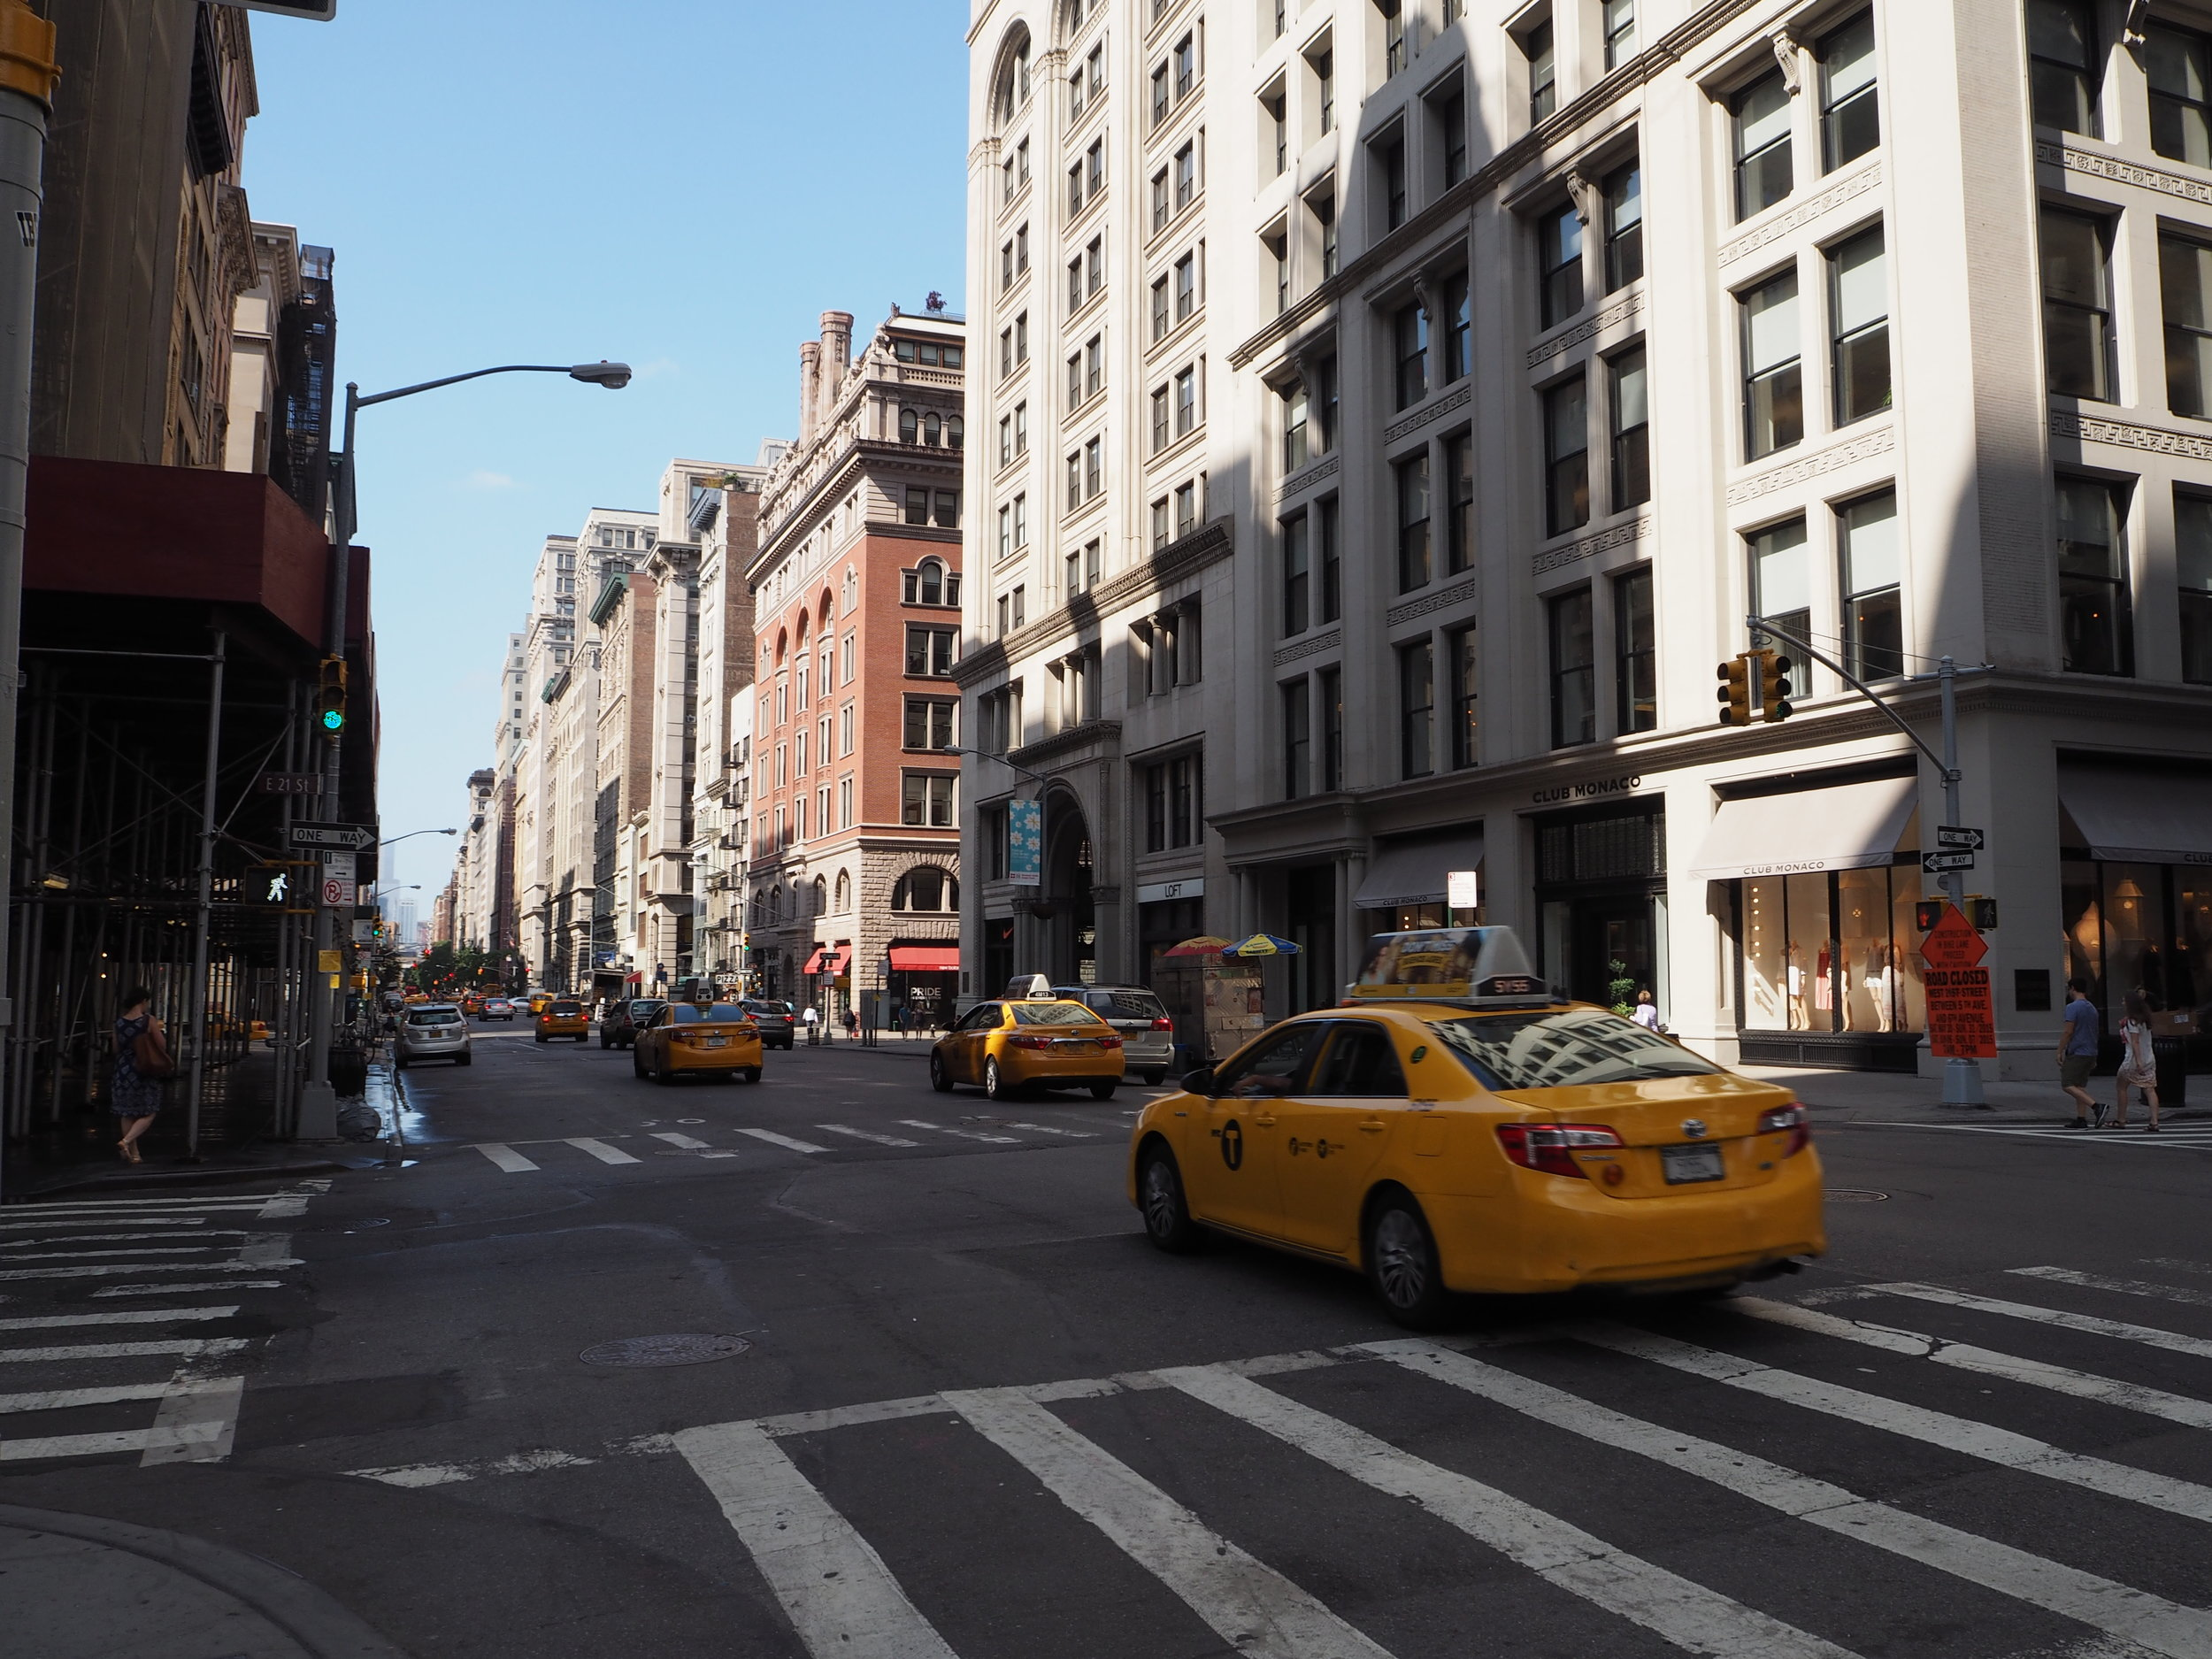 NYC_2015_0447.JPG